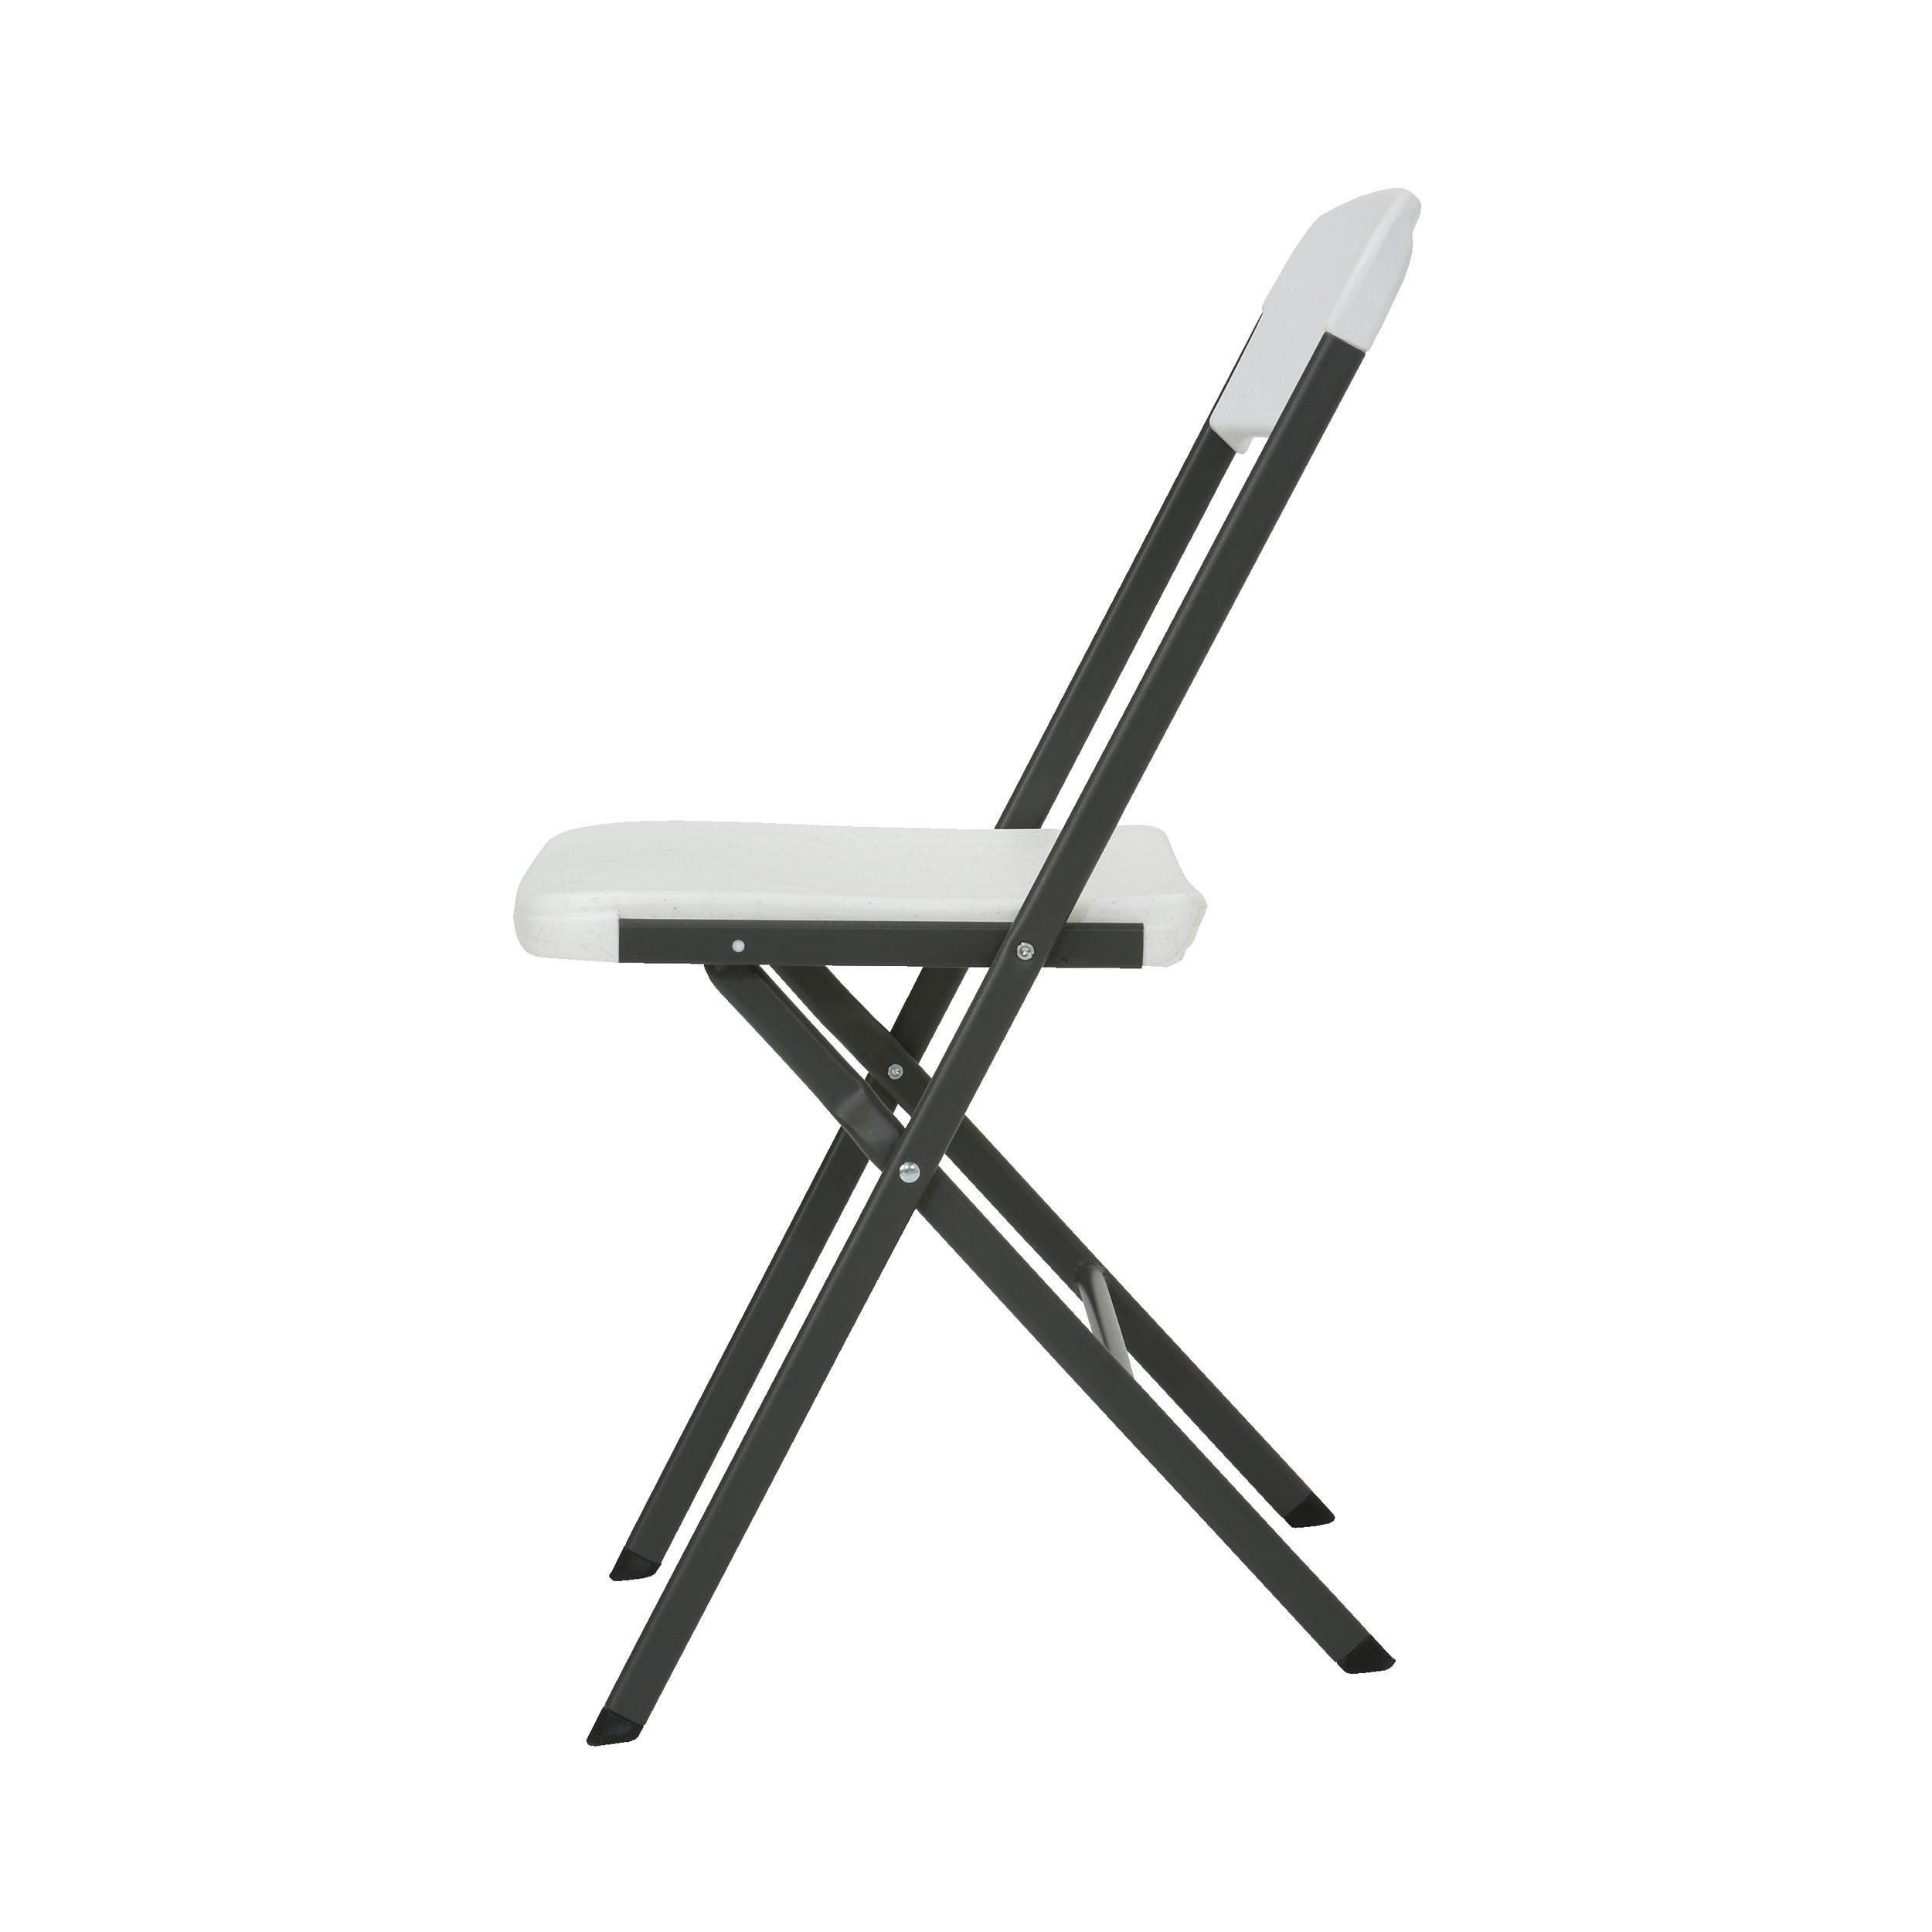 Stupendous Contemporary Residential White Granite Folding Chair Set Of 4 Interior Design Ideas Apansoteloinfo